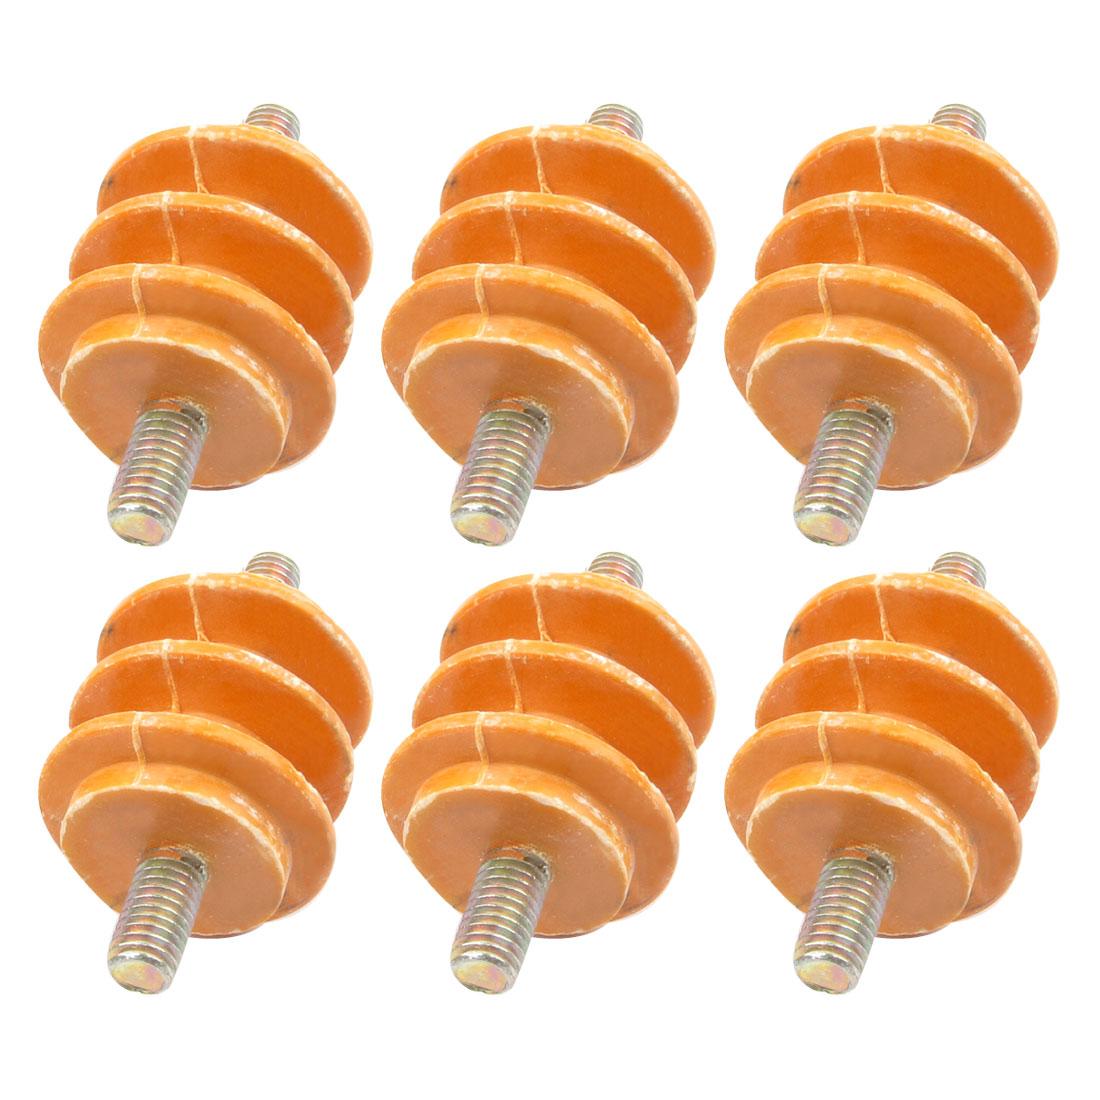 "6 Pieces 660V Water Resistance Busbar Insulator Orange 1.4"" x 1.3"" x 5/16"""